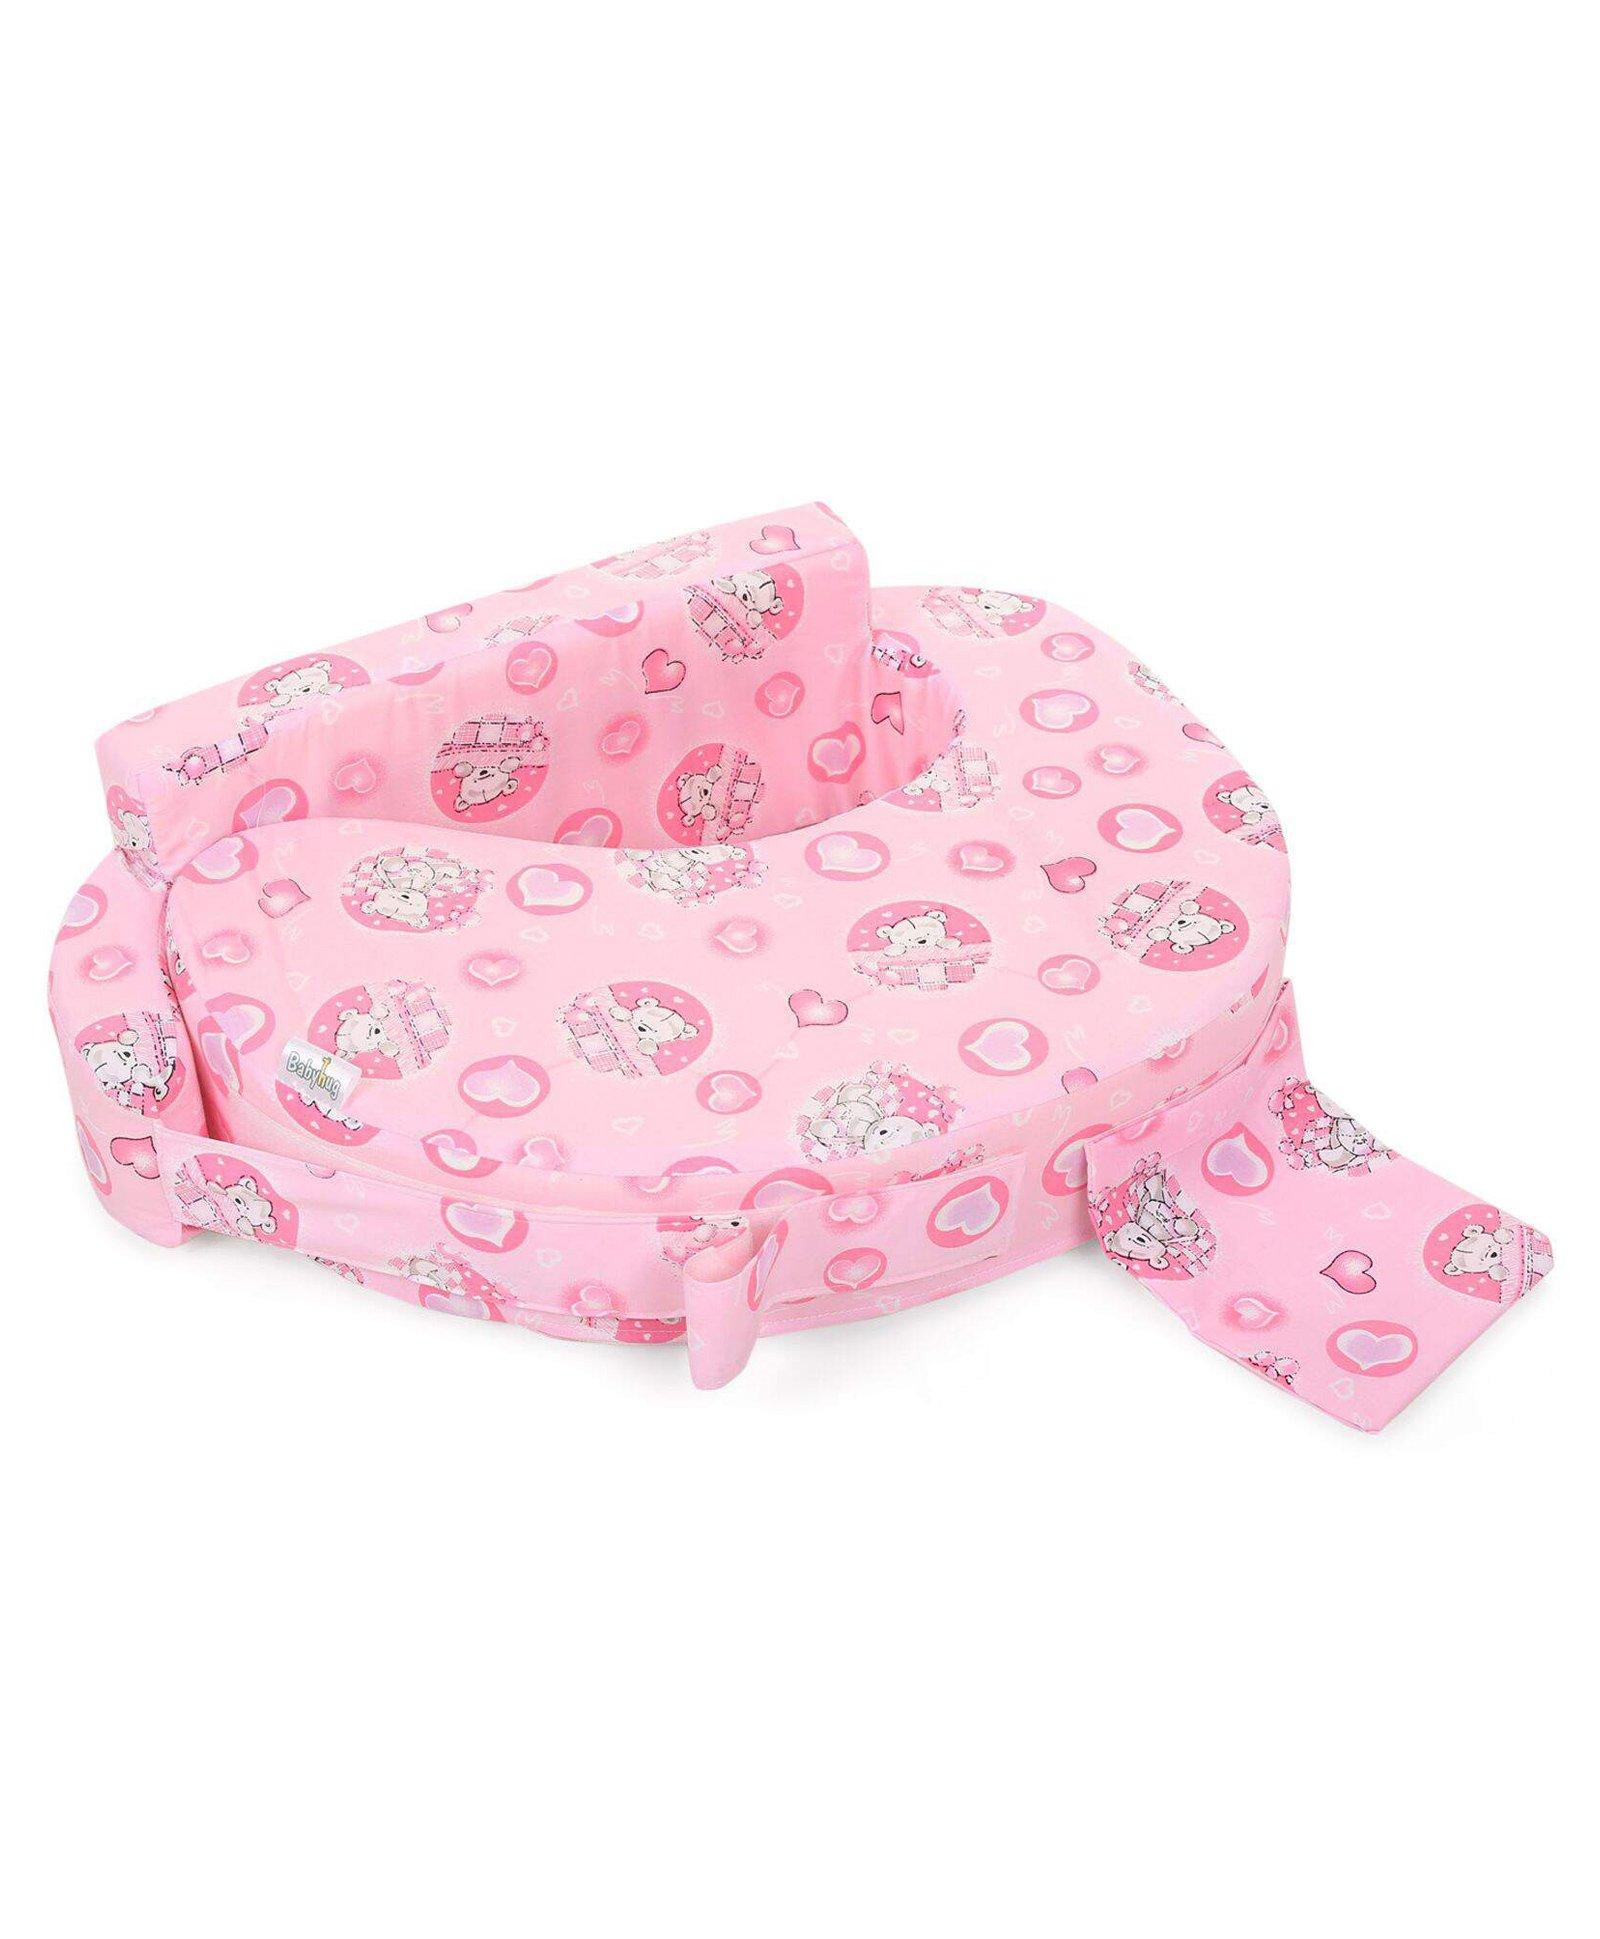 78e5a9b8421 Babyhug Feeding Pillow Teddy   Hearts Print Pink Online in India ...